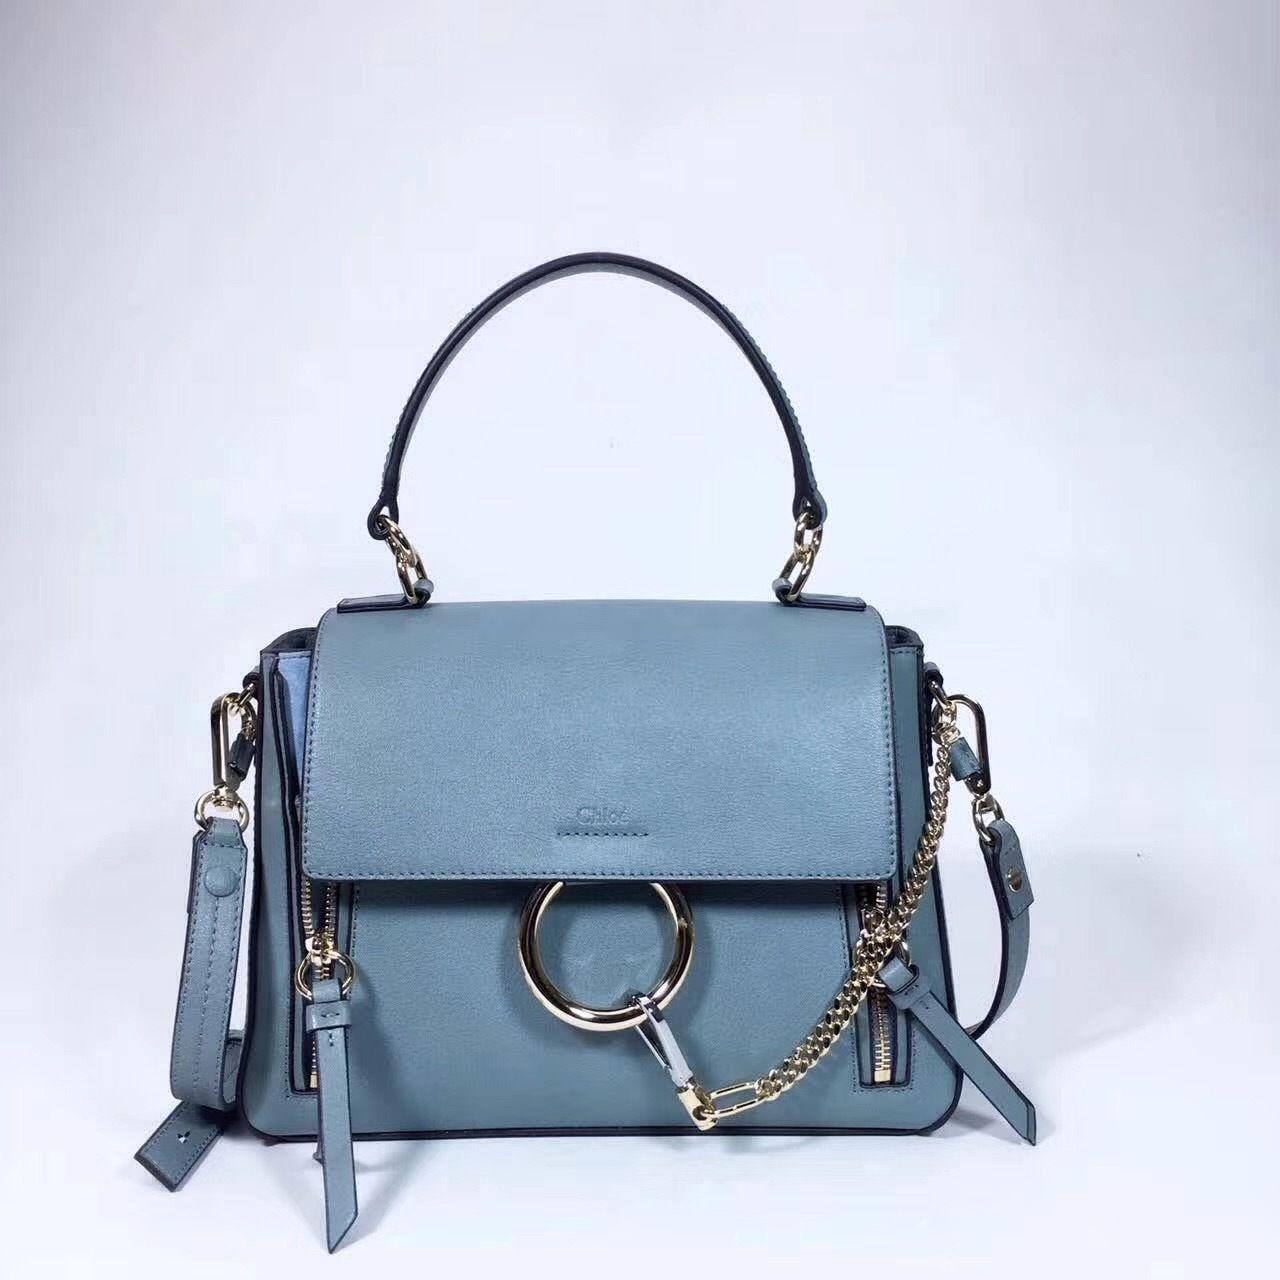 15a89c8d928a Bag · Prada Cahier Trompe l'Oeil Velvet Shoulder Bag Camel - Bella Vita Moda  ...